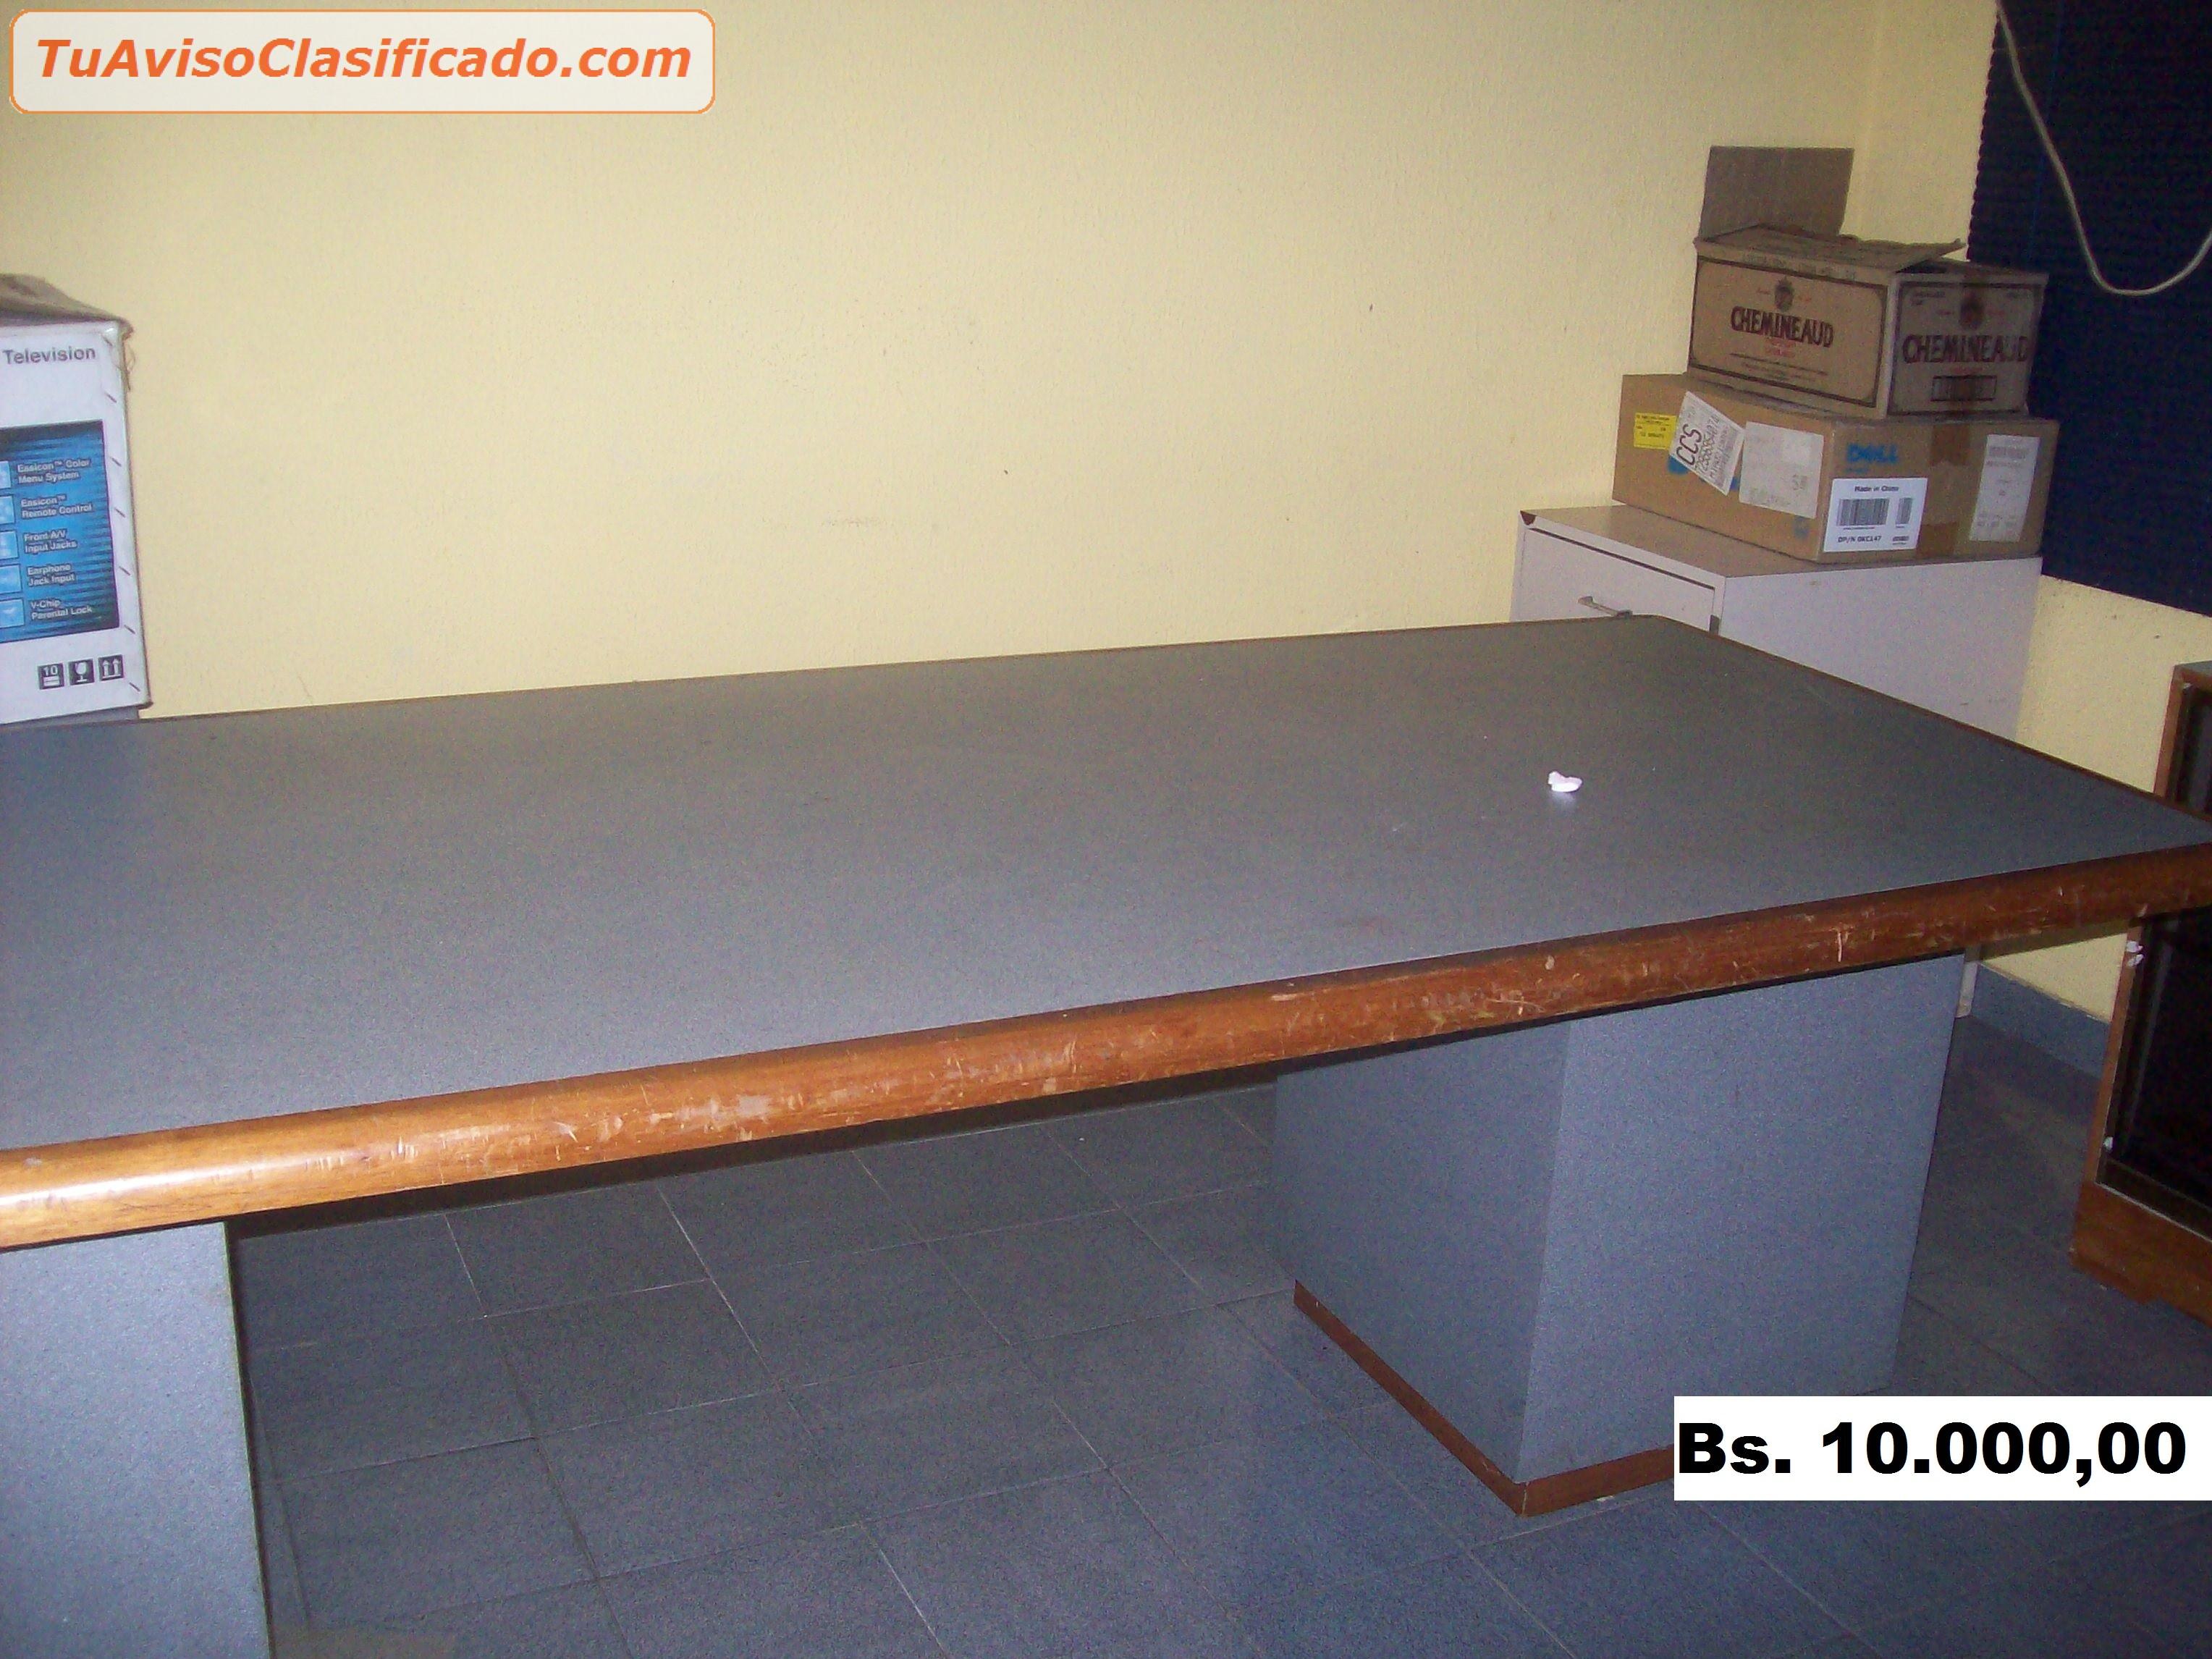 escritorios usados escritorios usados escritorios usados escritorios usados